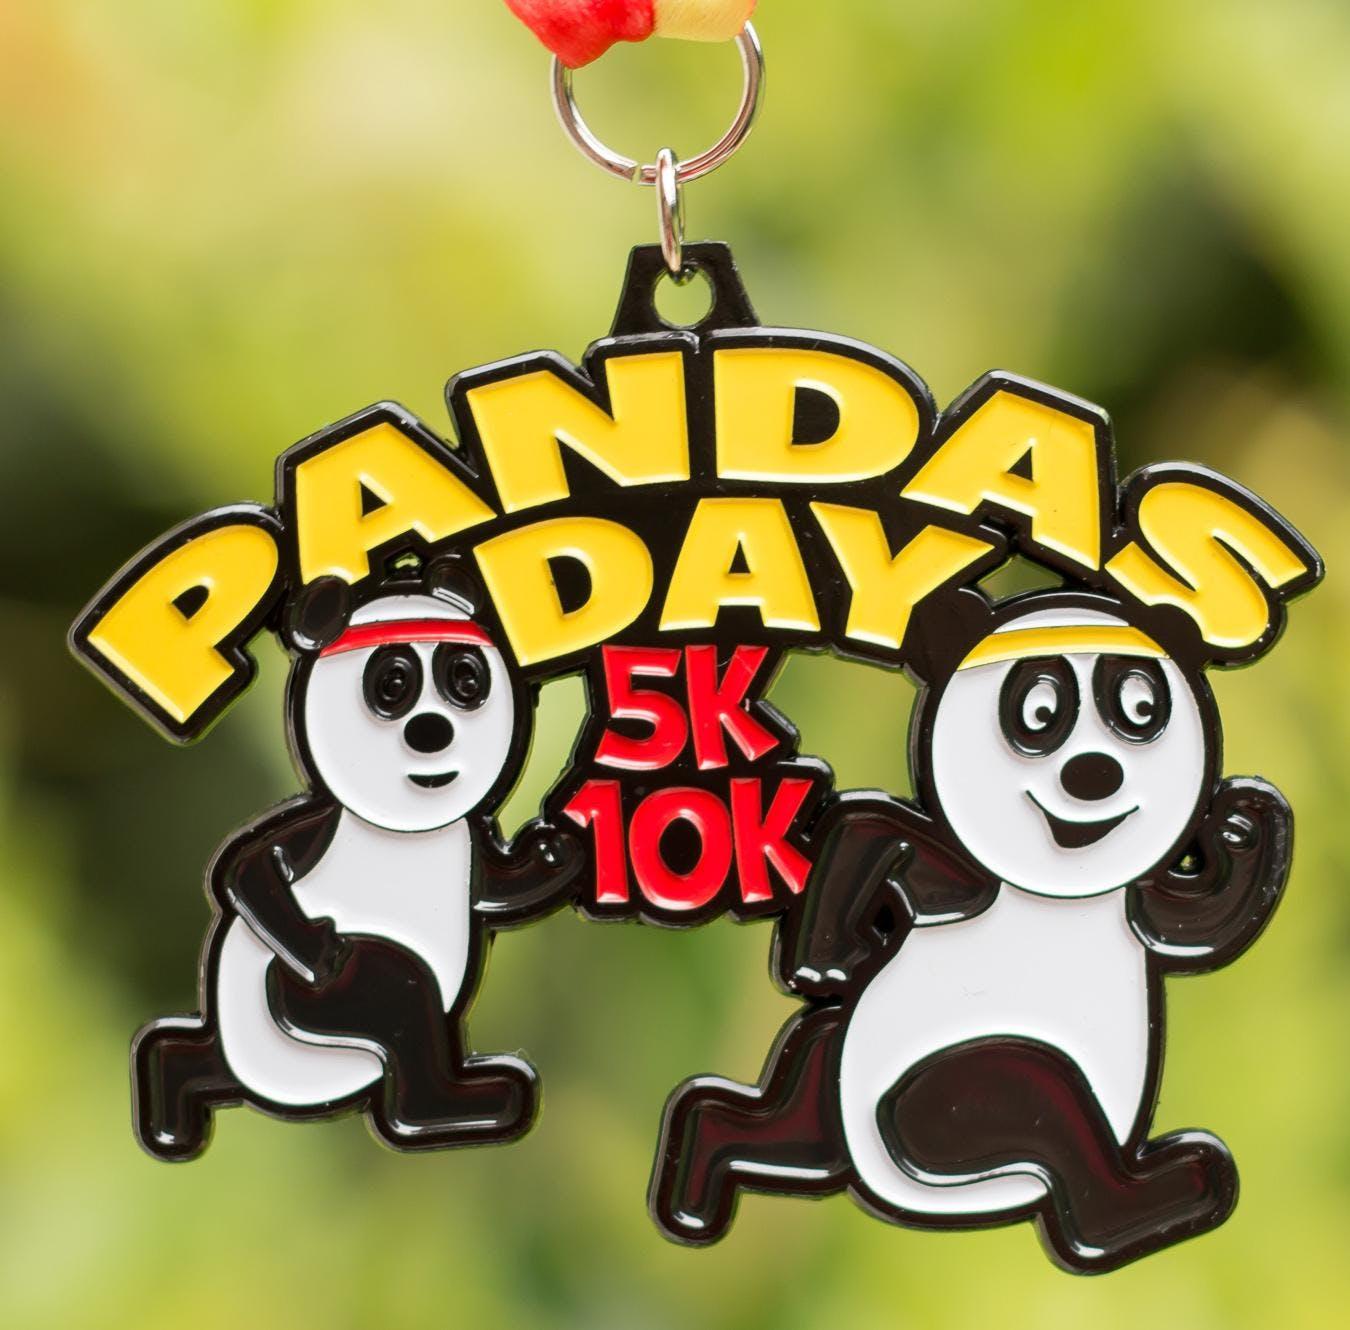 Now Only $8! PANDAS Day 5K & 10K - Tucson